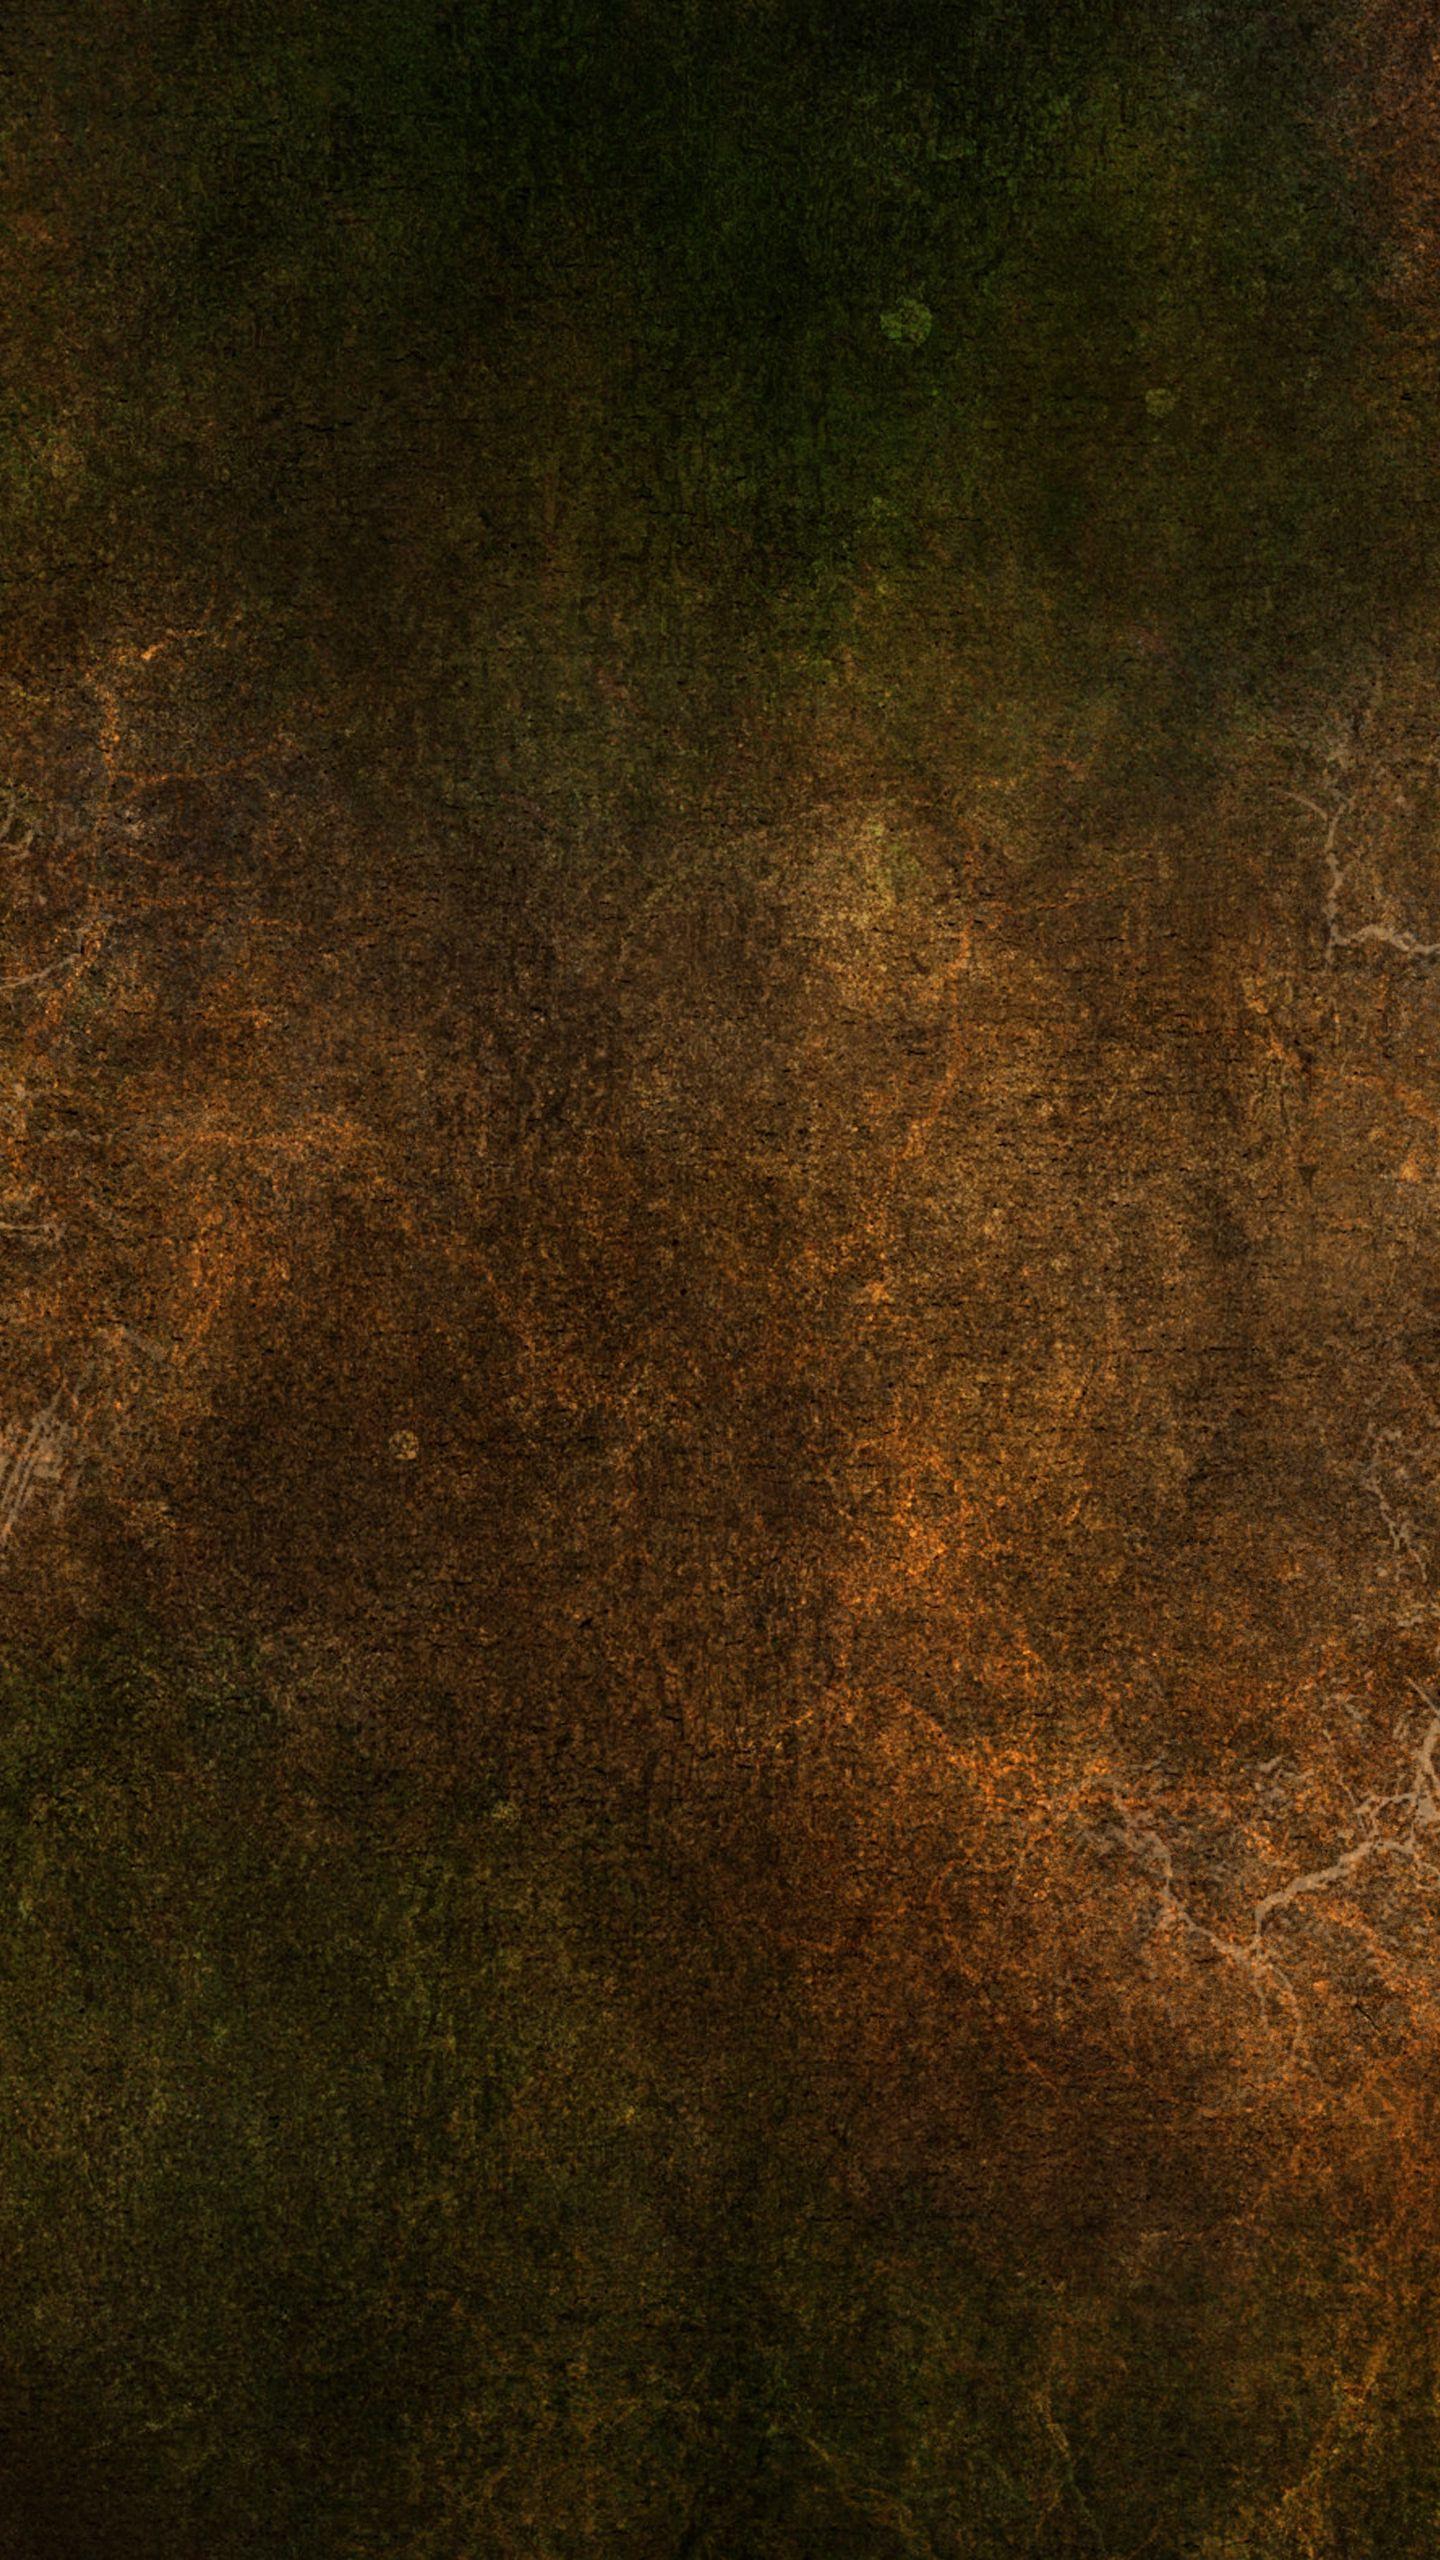 1440x2560 Wallpaper grunge, vintage, paper, stains